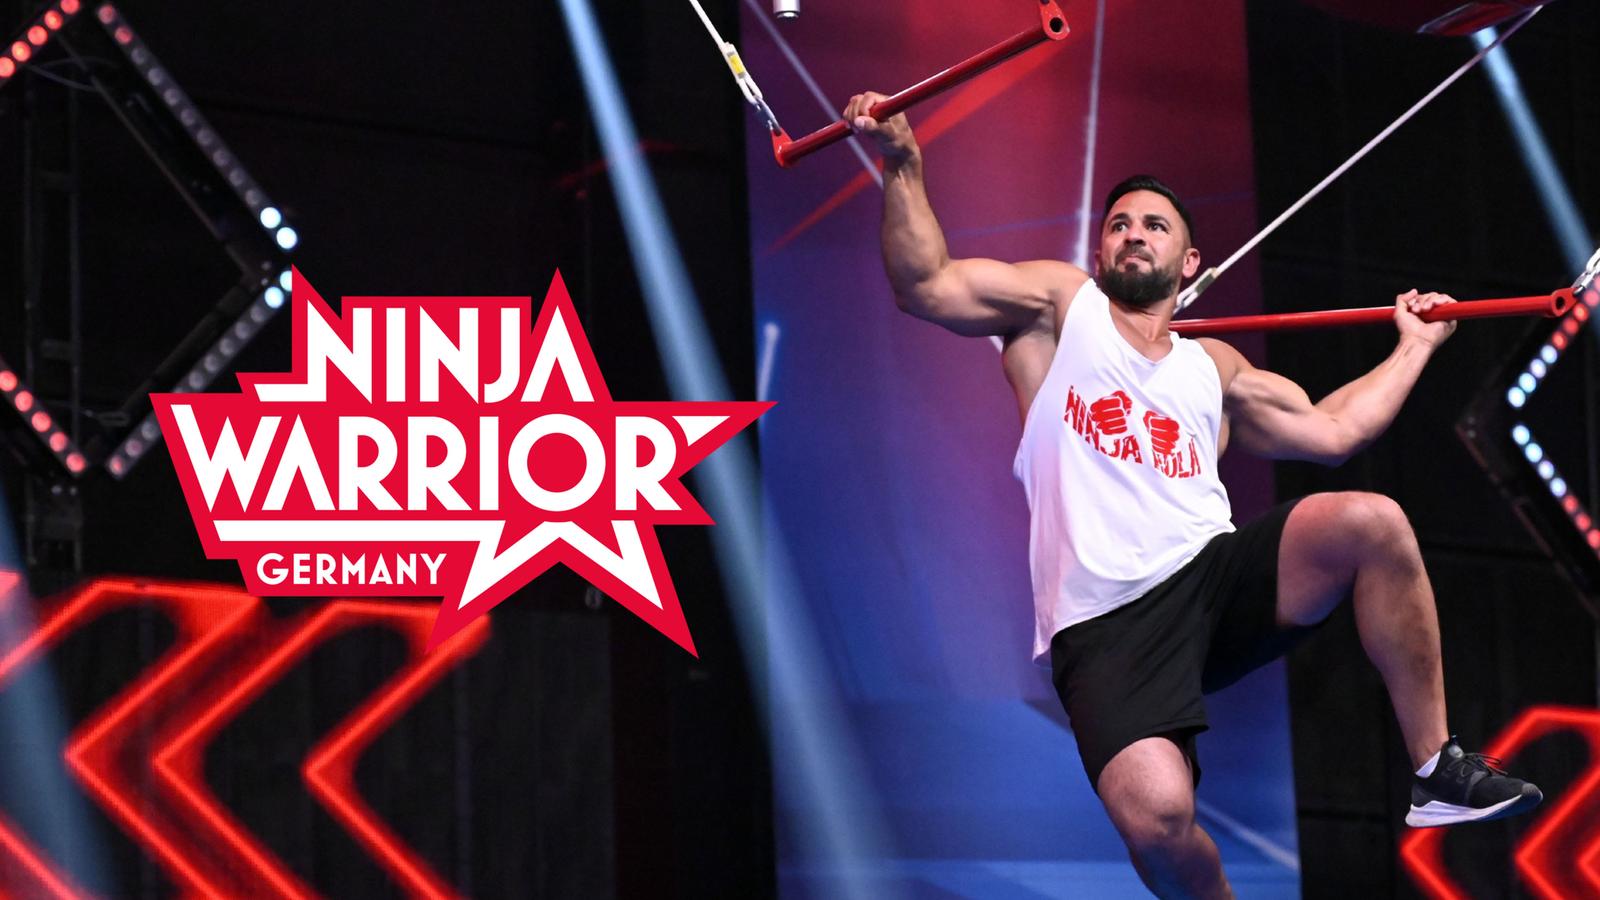 Ninja Warrior Germany Tickets 2021